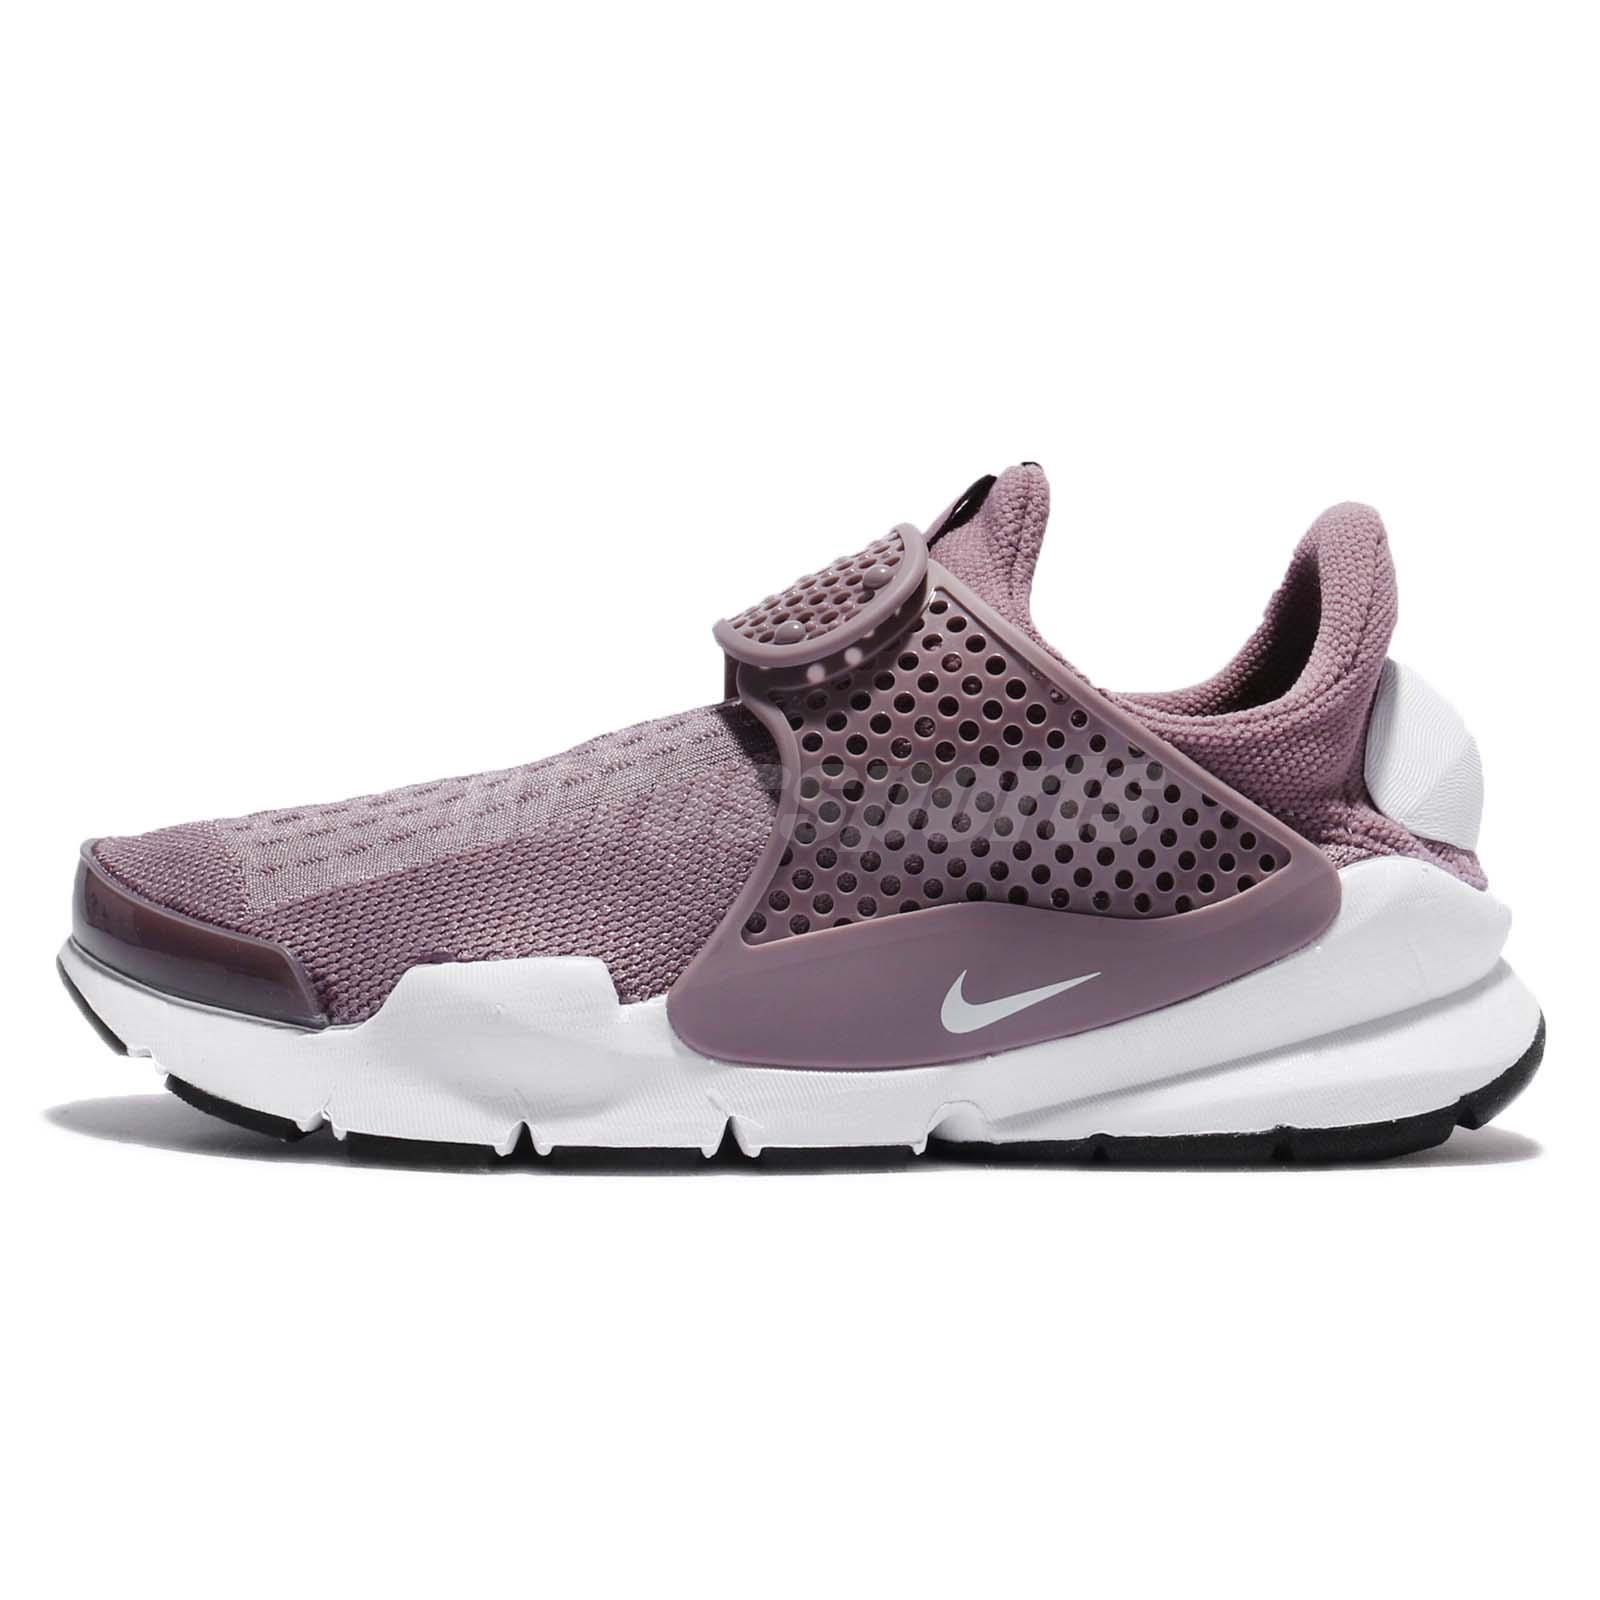 9e036300c3f096 Wmns Nike Sock Dart Taupe Grey White Women Shoes Sneakers Slip-On 848475-201